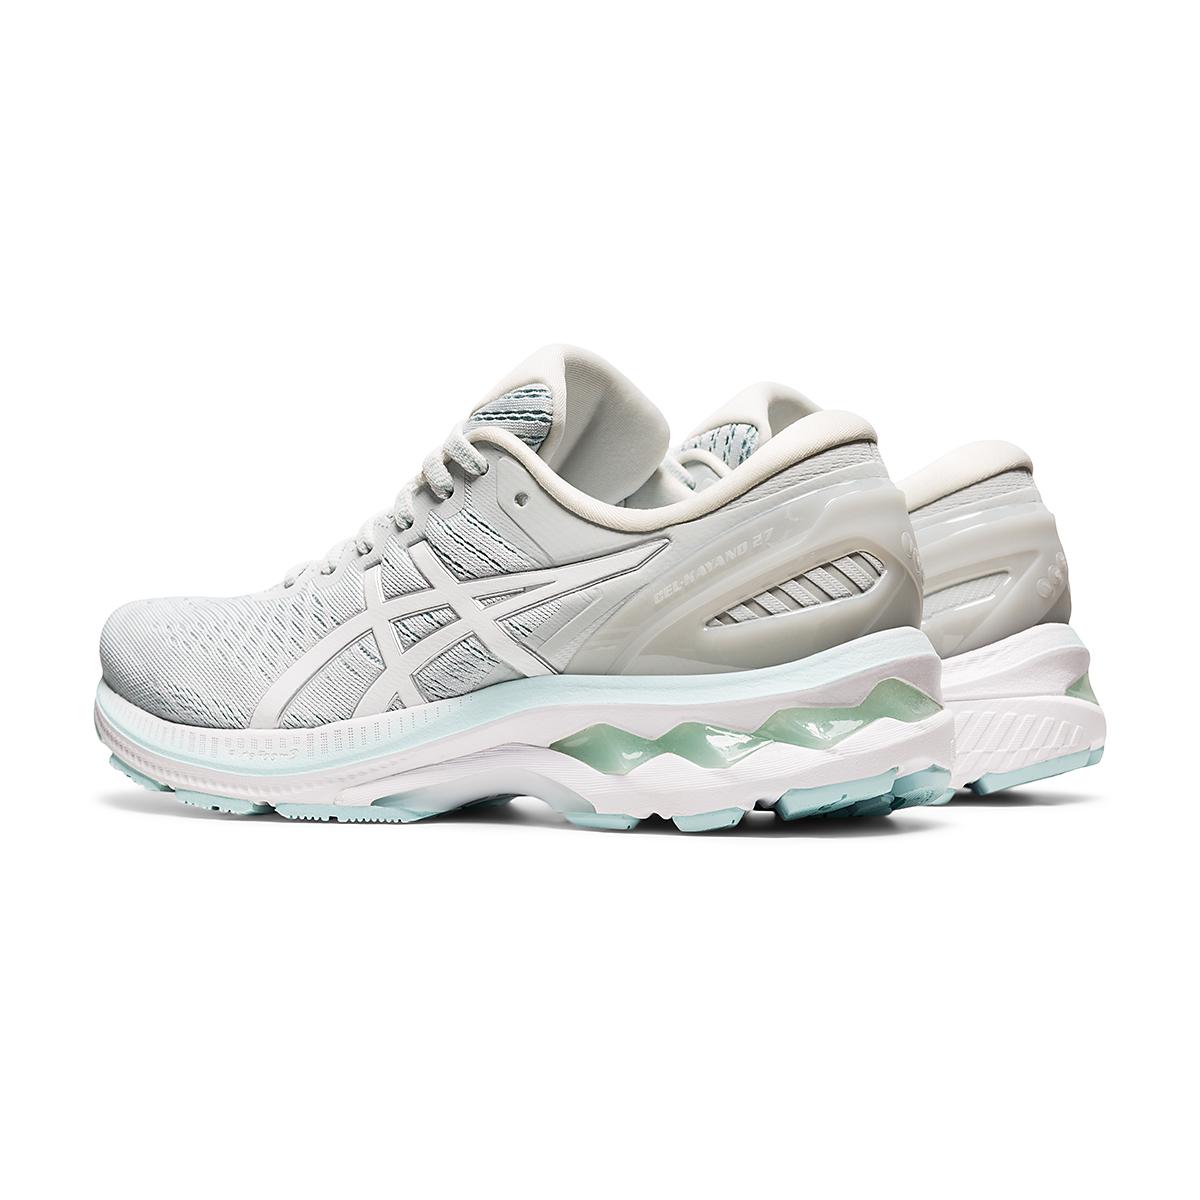 Women's Asics GEL-Kayano 27 Running Shoe - Color: Glacier Grey/White - Size: 6 - Width: Regular, Glacier Grey/White, large, image 4